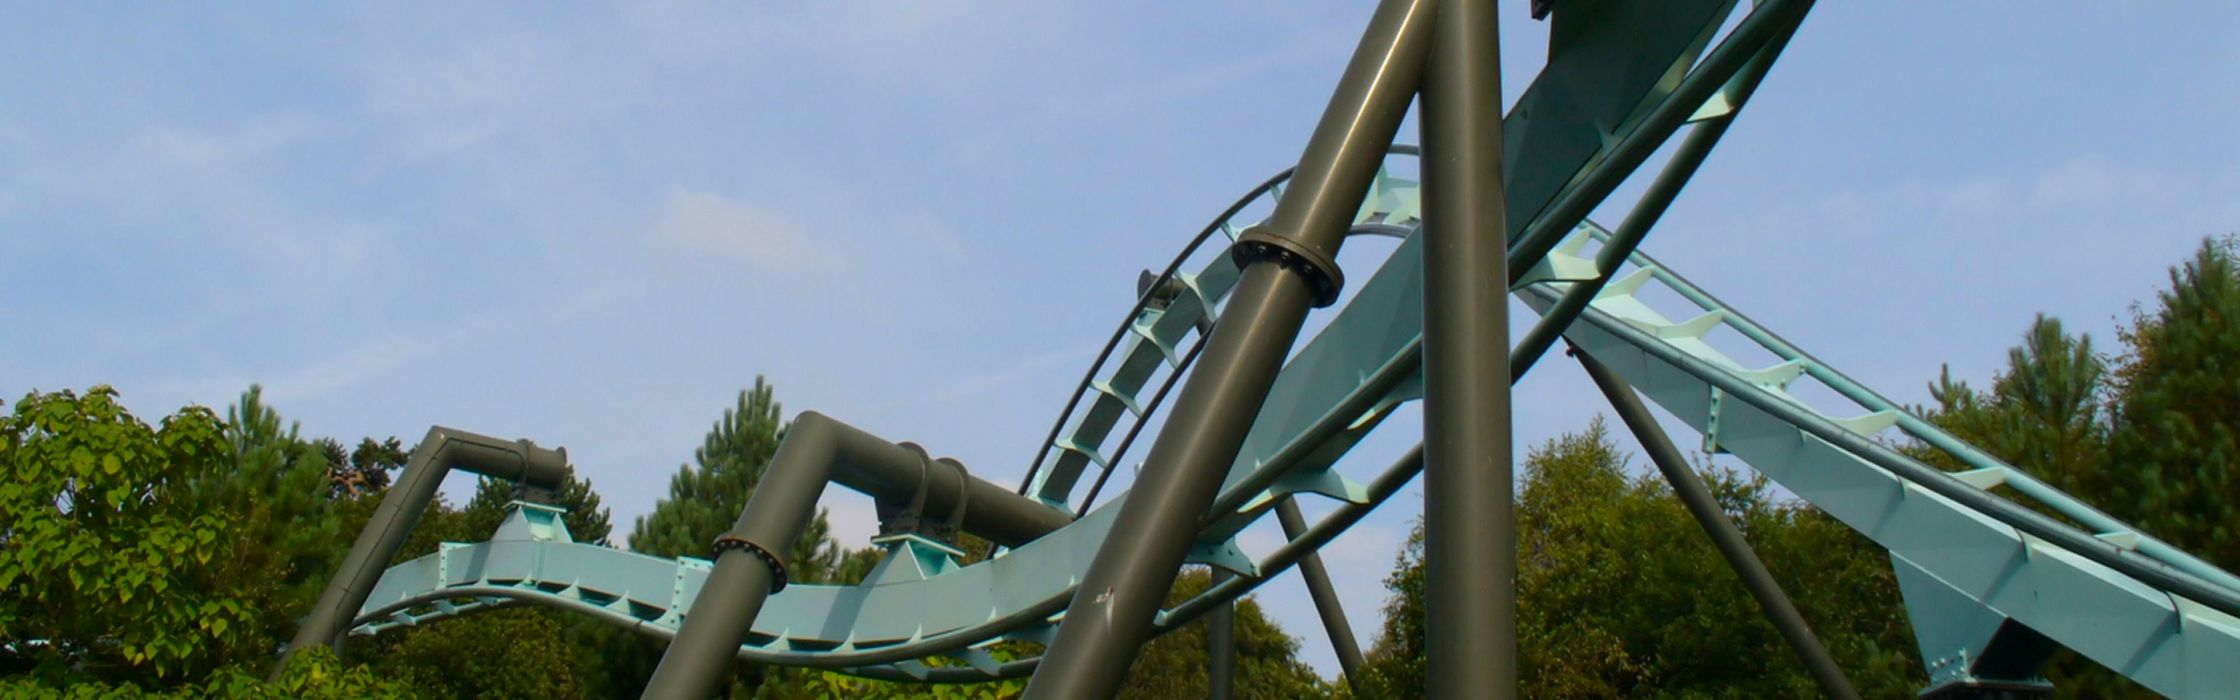 roller coasters wallpaper